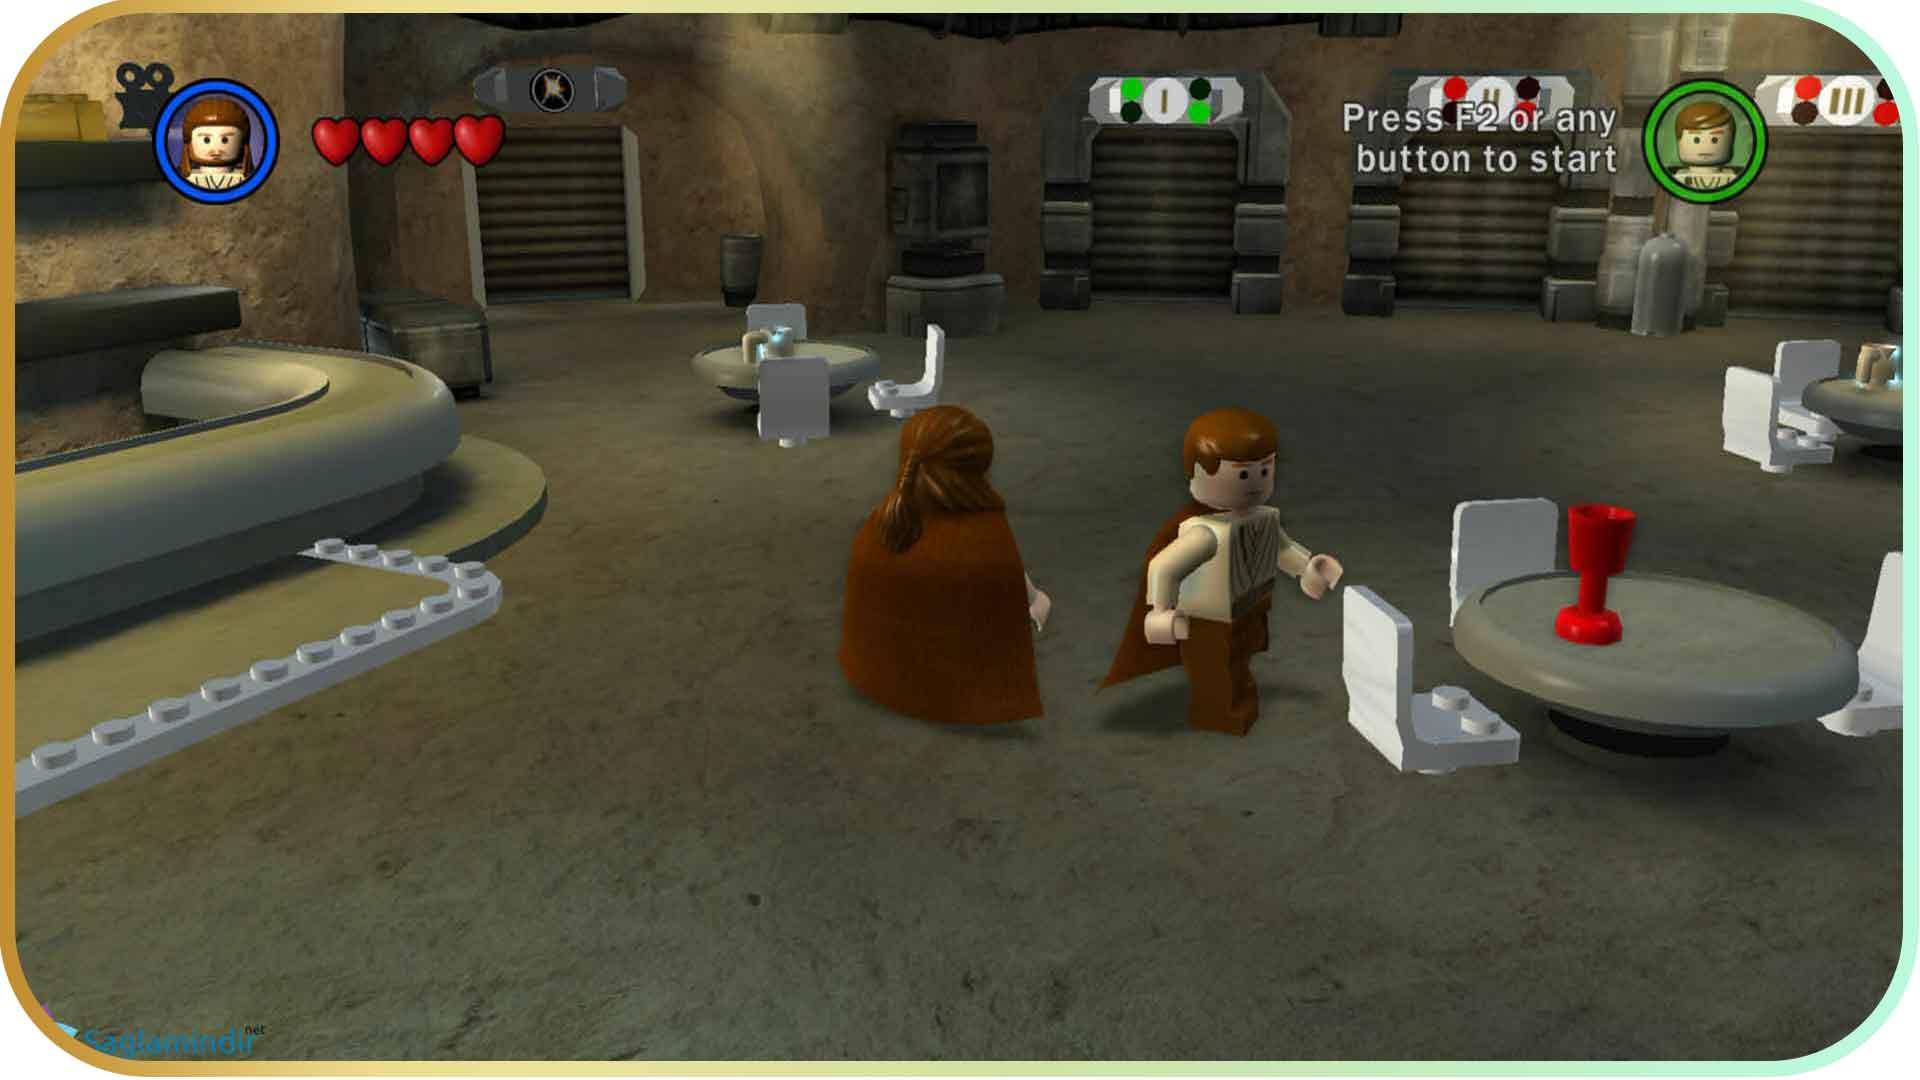 Lego Star Wars The Complete Saga full indir